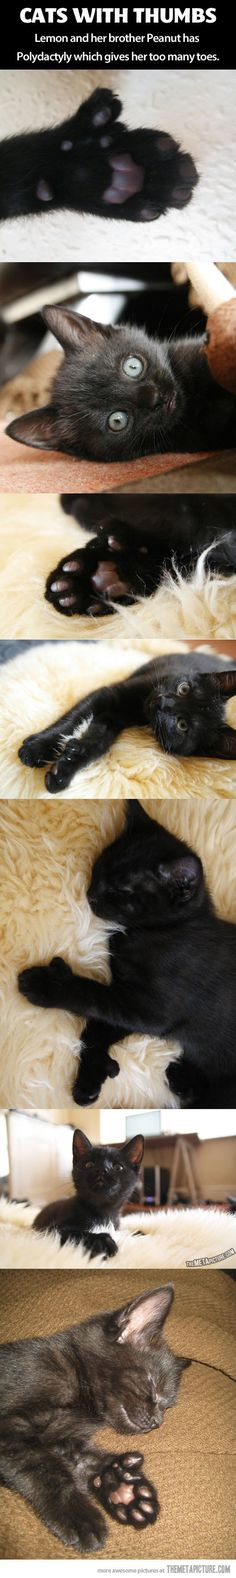 More cat feets...